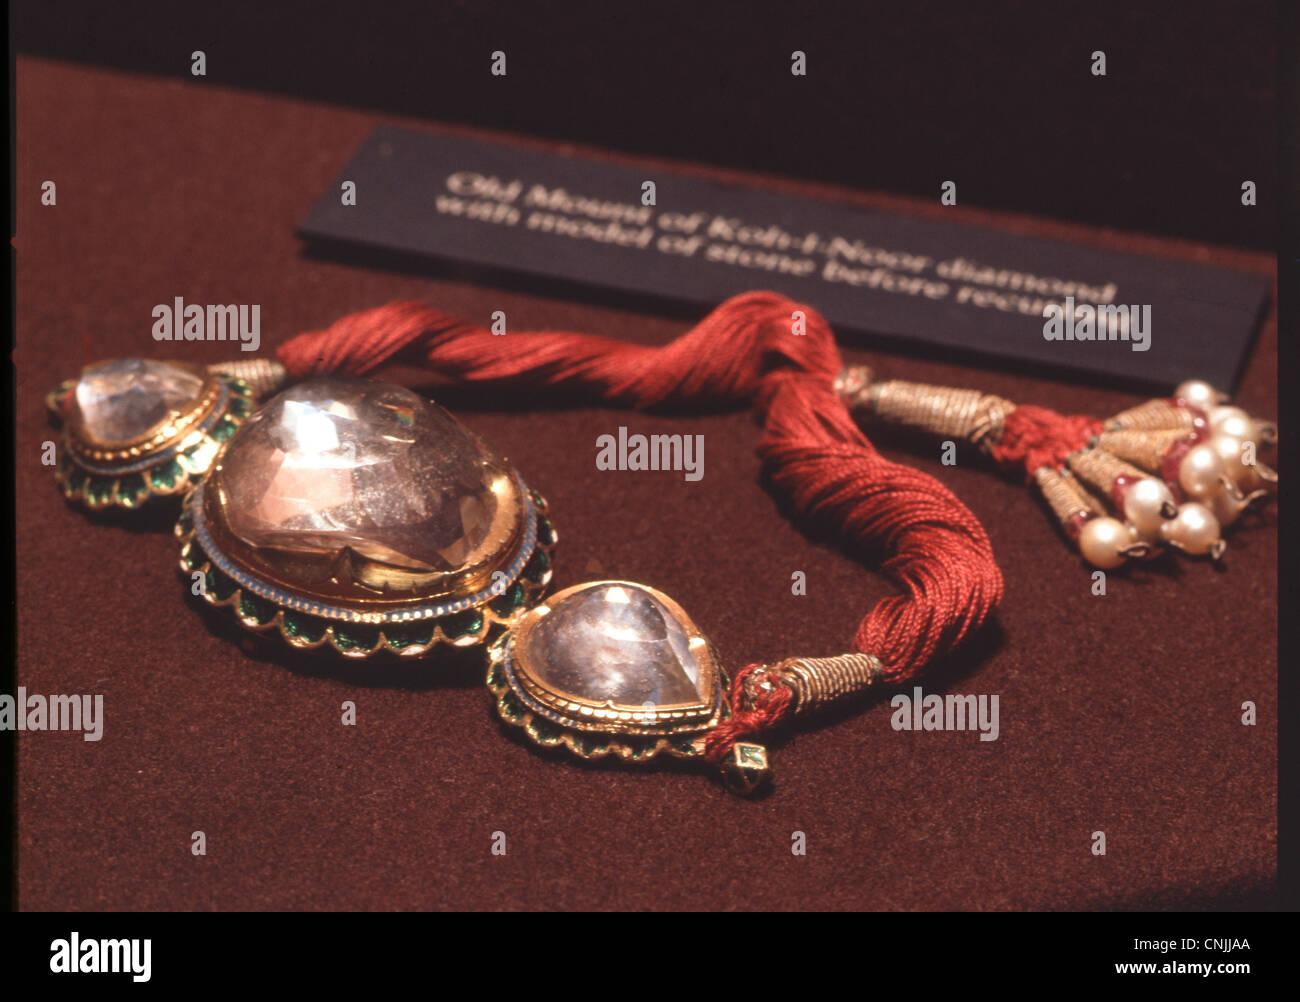 Crown Jewels, The Koh-i-Noor Diamond. - Stock Image